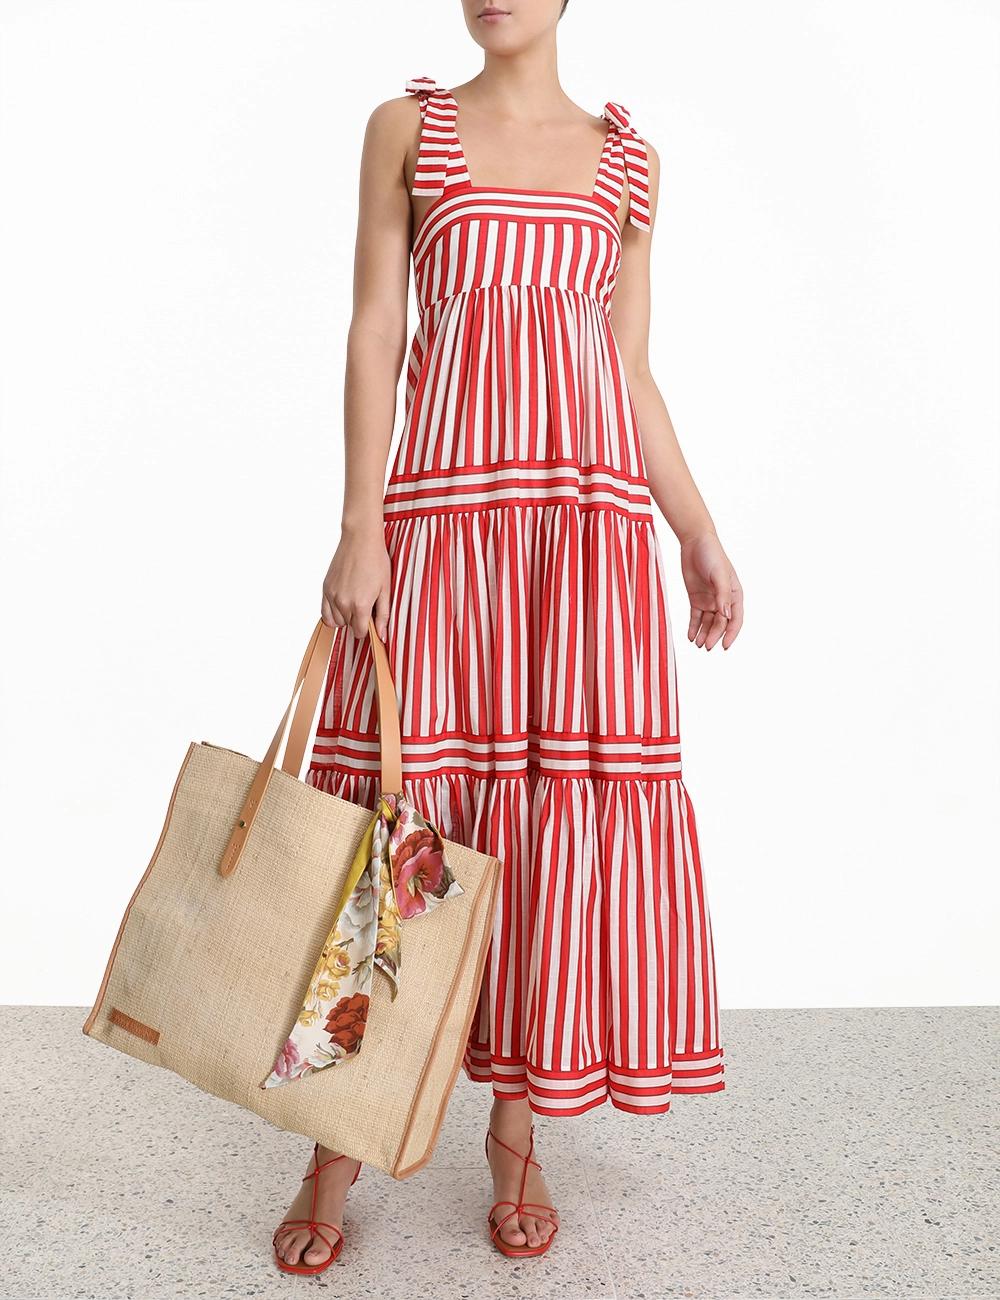 Zinnia Stripe Tie Tiered Dress Red Stripe Online Zimmermann Striped Dress Summer Summer Dress Outfits Red Striped Dress [ 1300 x 1000 Pixel ]